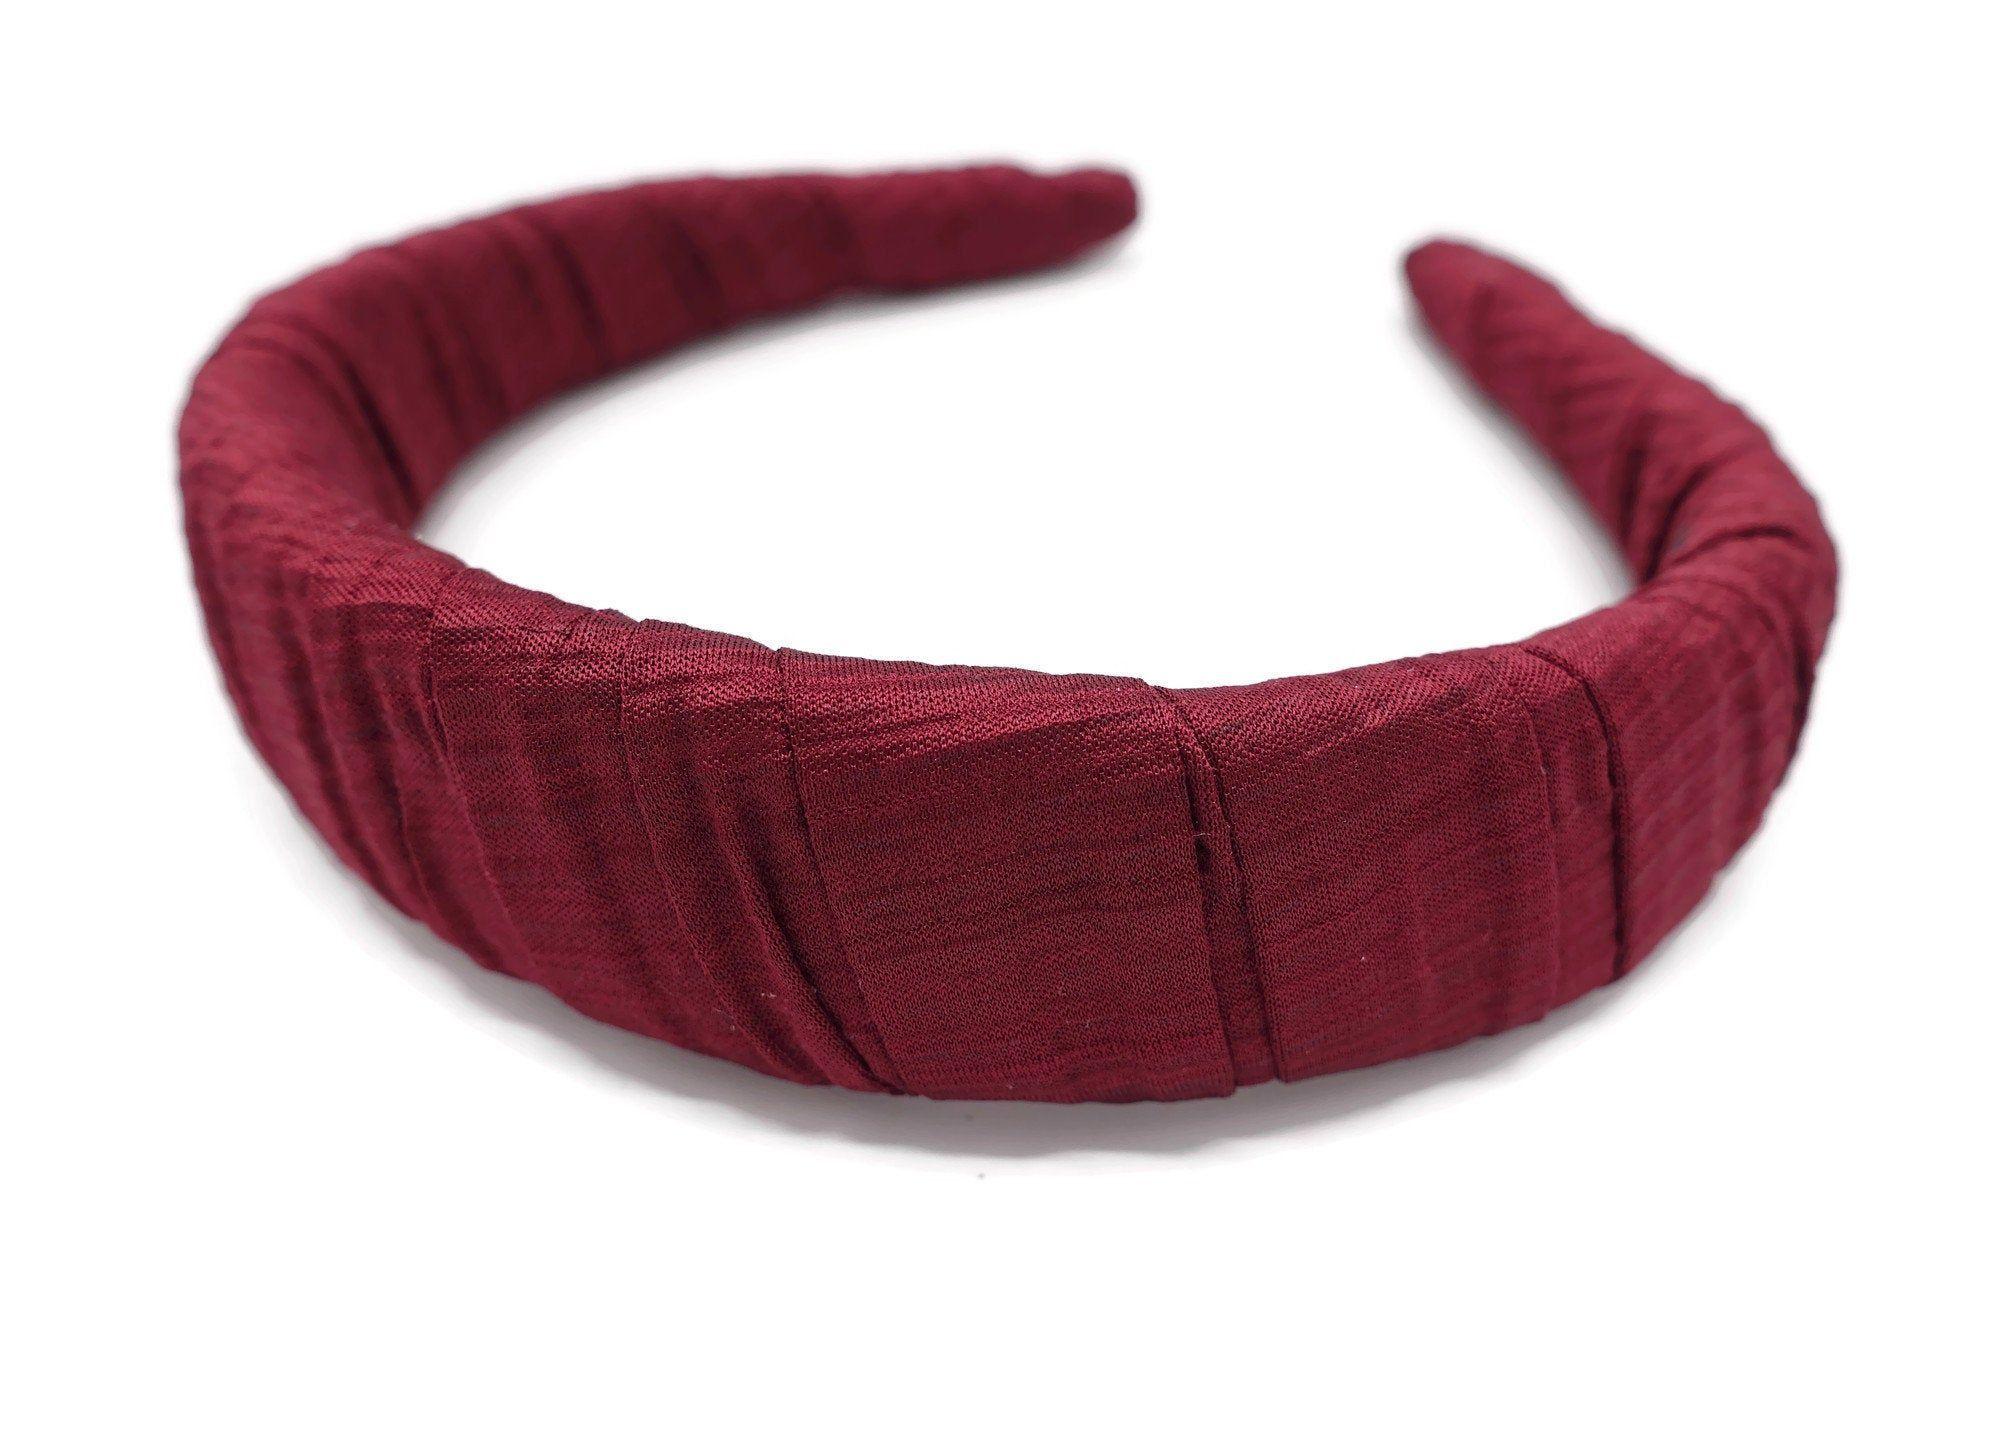 padded headband corrugated fabric wrap hairband pleated women hair accessory  padded headband corrugated fabric wrap hairband pleated women hair accessory #HighHeadband #PaddedH #Accessory #corrugated #Fabric #hair #Hairband #Headband #padded #pleated #Women #wrap